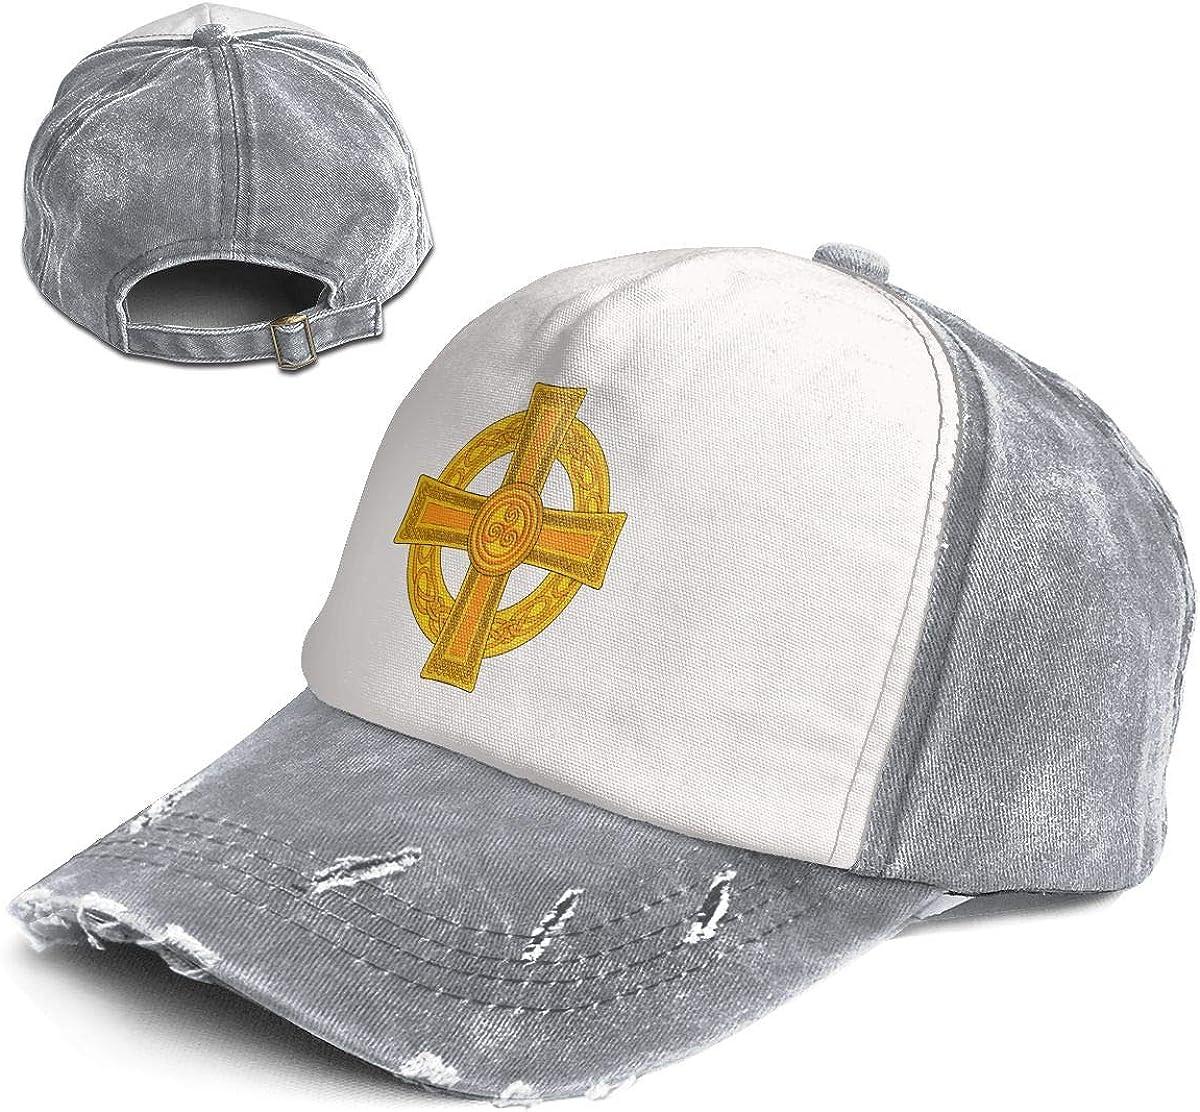 Fashion Vintage Hat Celtic Cross Ancient Celtic Symbols Adjustable Dad Hat Baseball Cowboy Cap